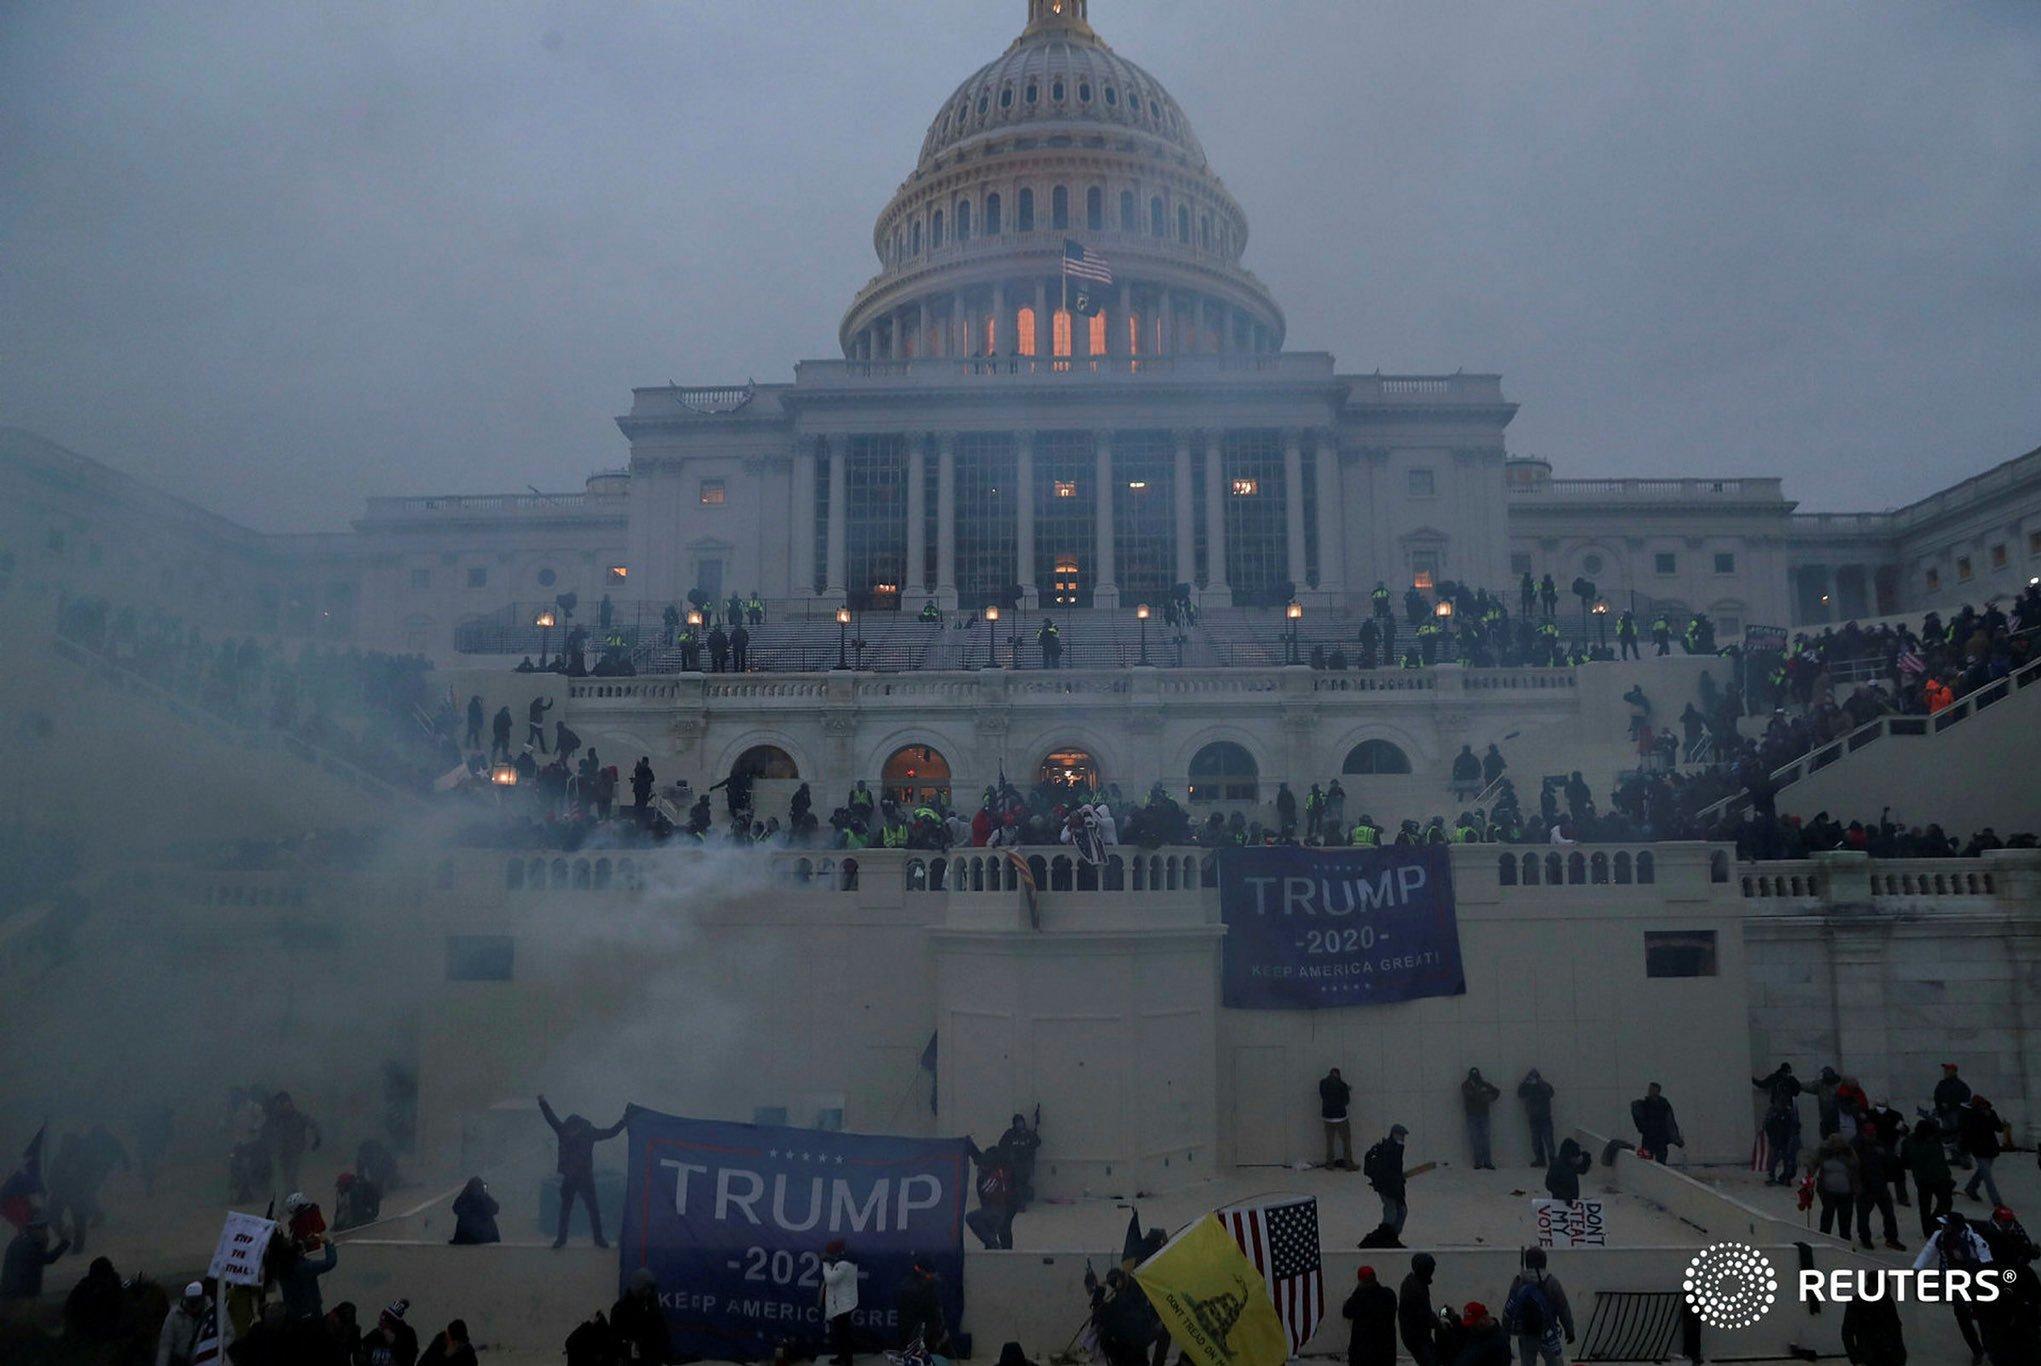 13991018000132 Test NewPhotoFree - بحران آمریکا| برقراری حکومت نظامی در واشنگتن؛ 4 نفر کشته شدند